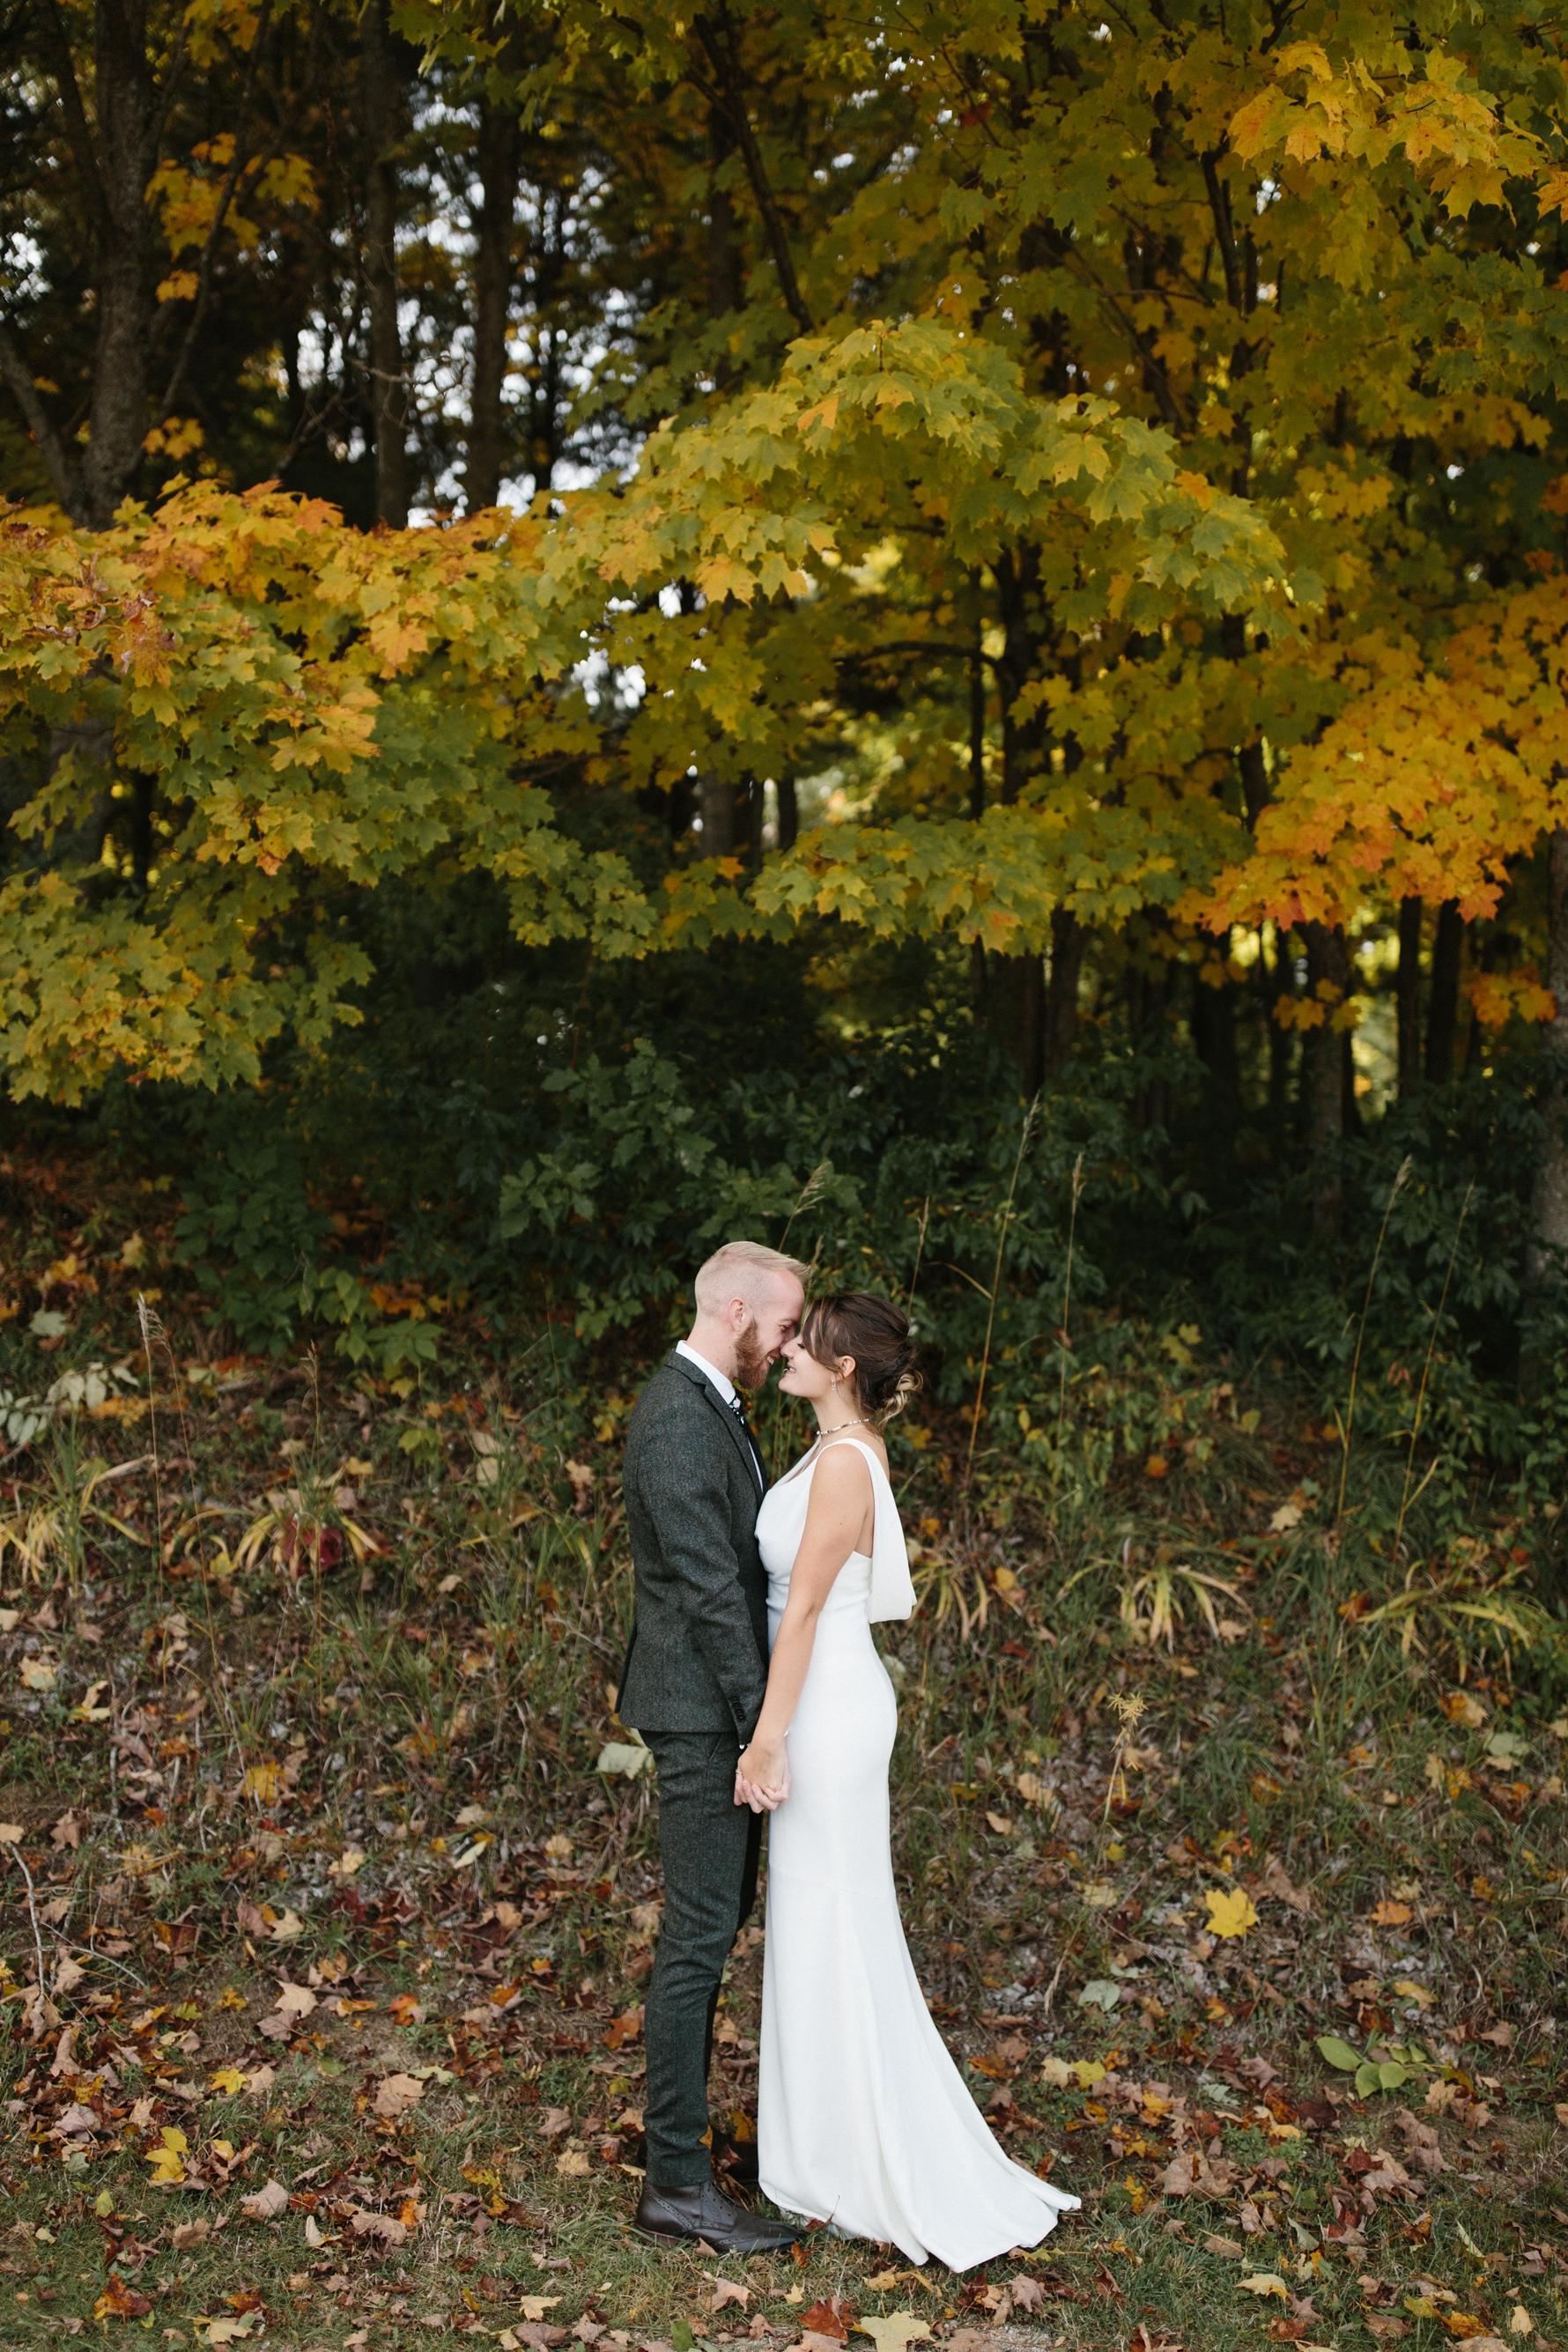 norris-traverse-city-wedding-20.JPG